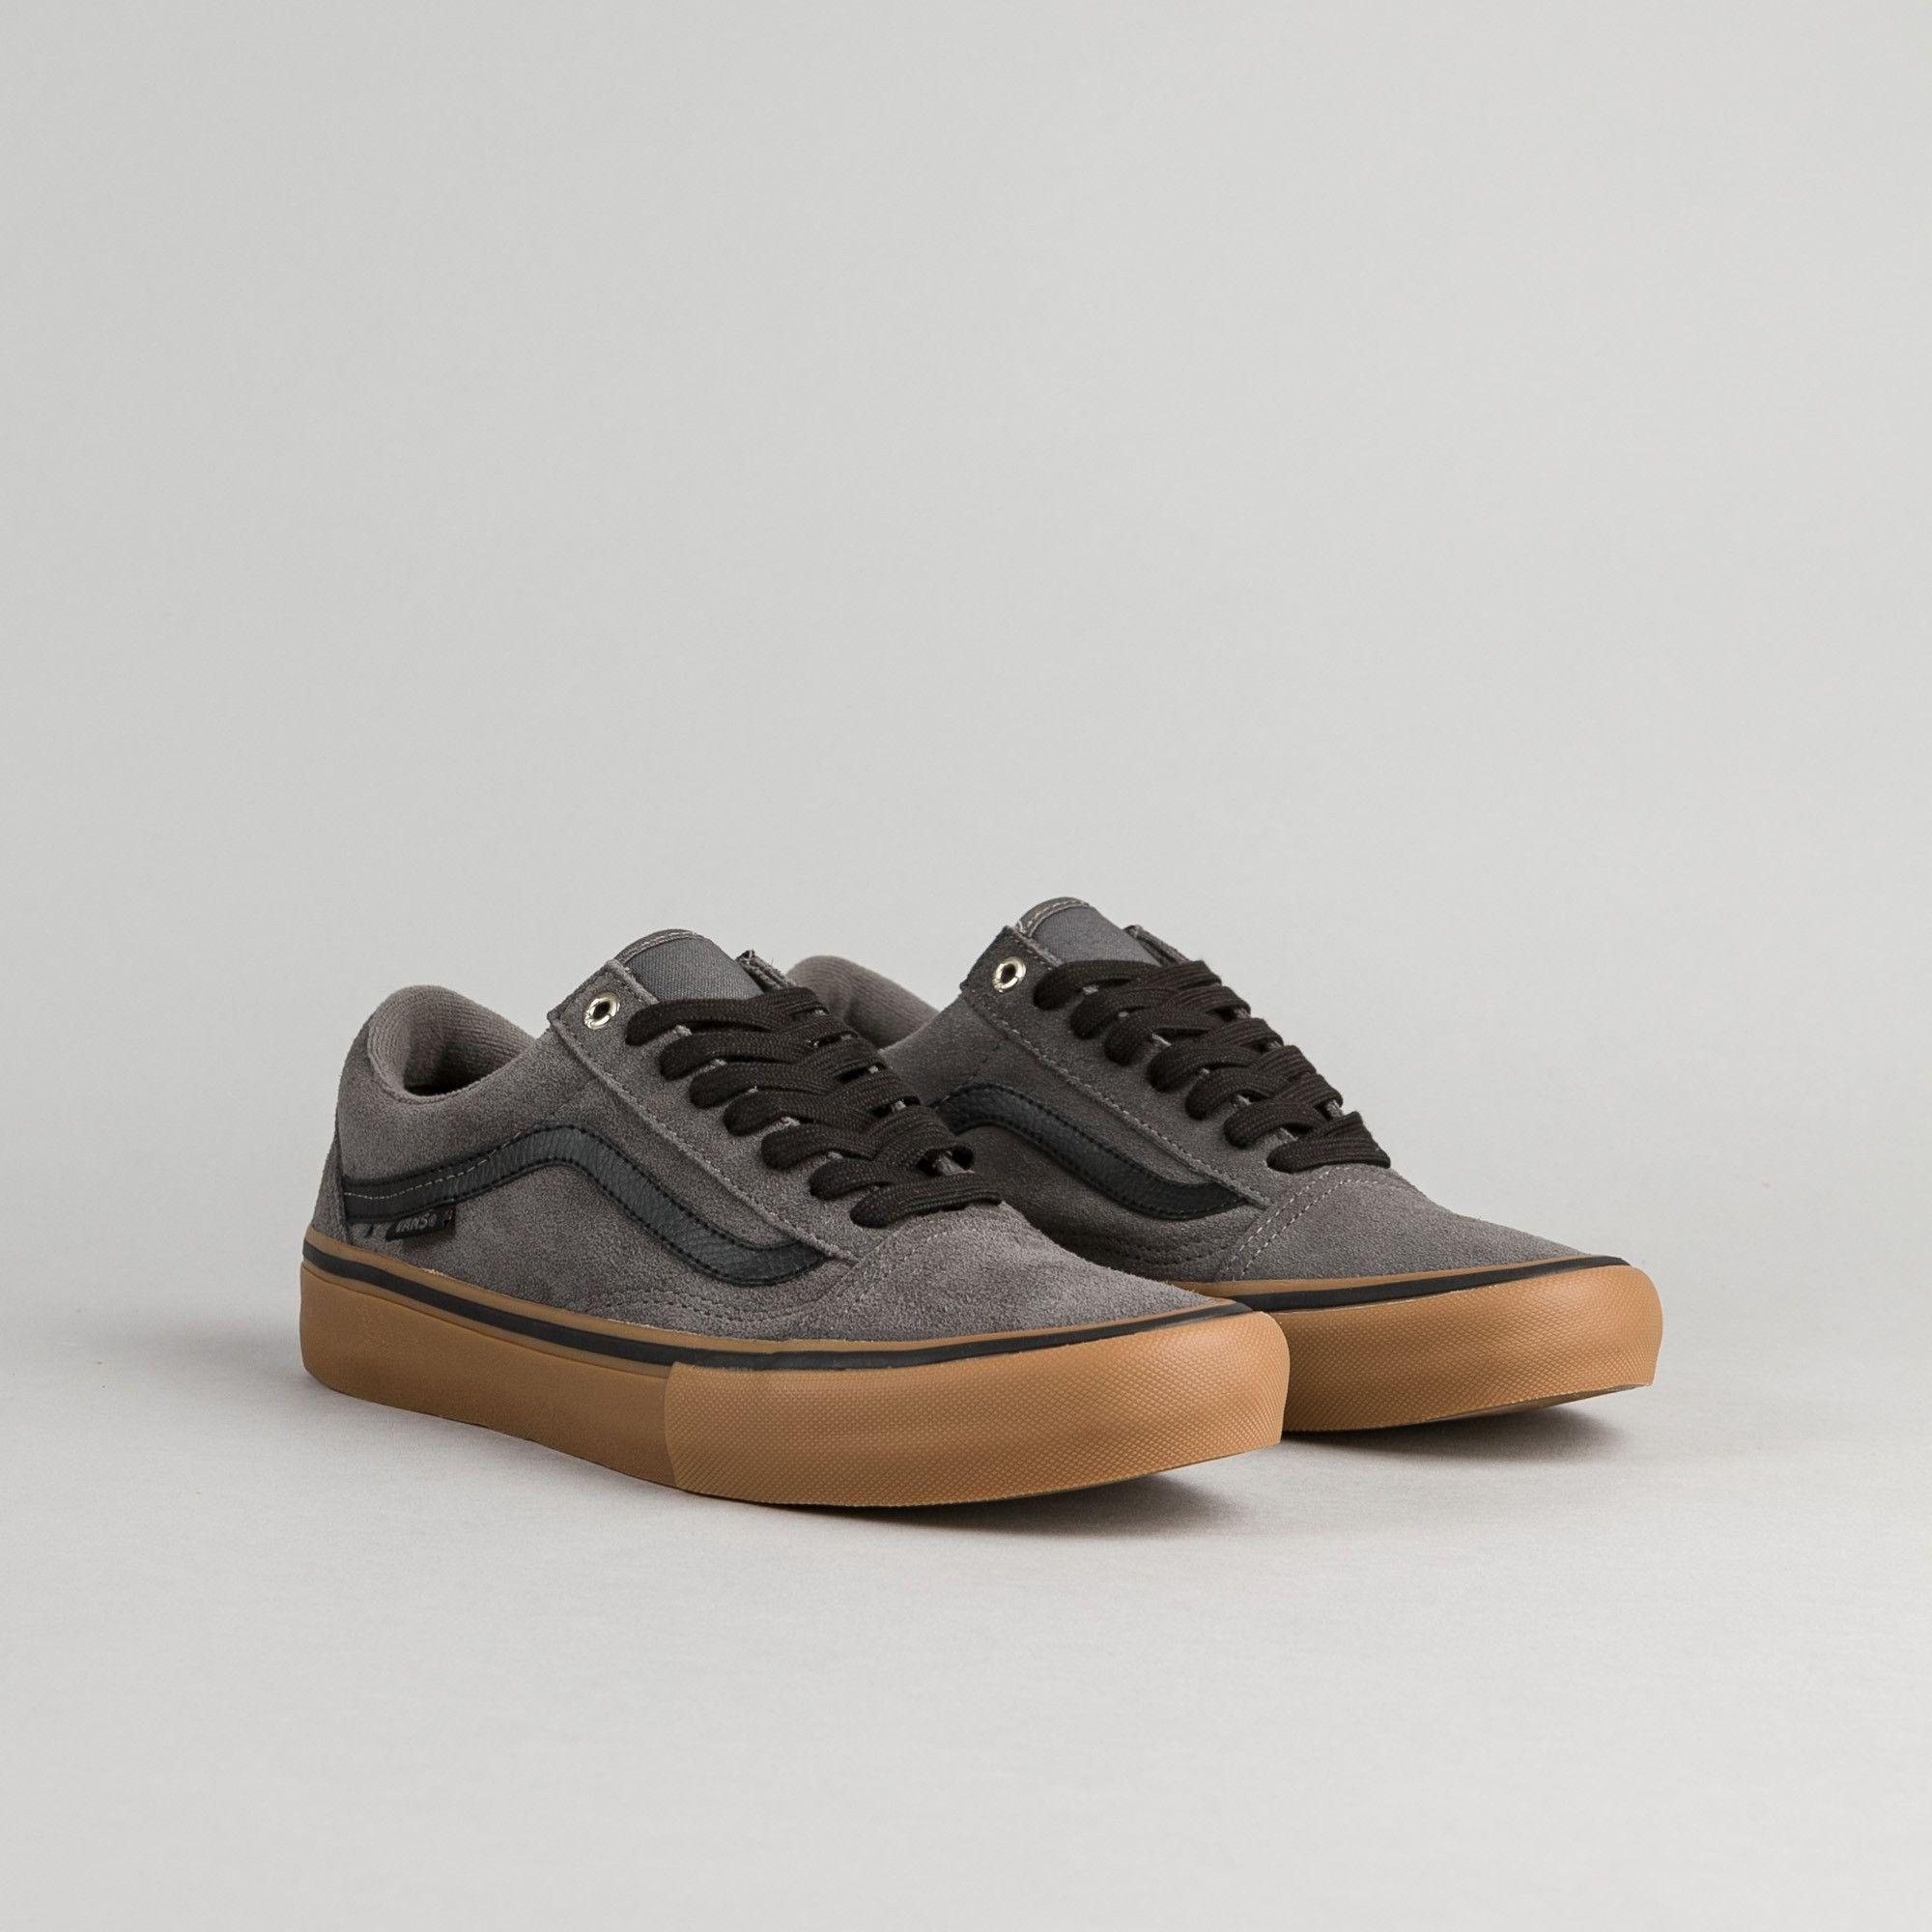 Vans Old Skool Pro Shoes - Grey / Black / Gum